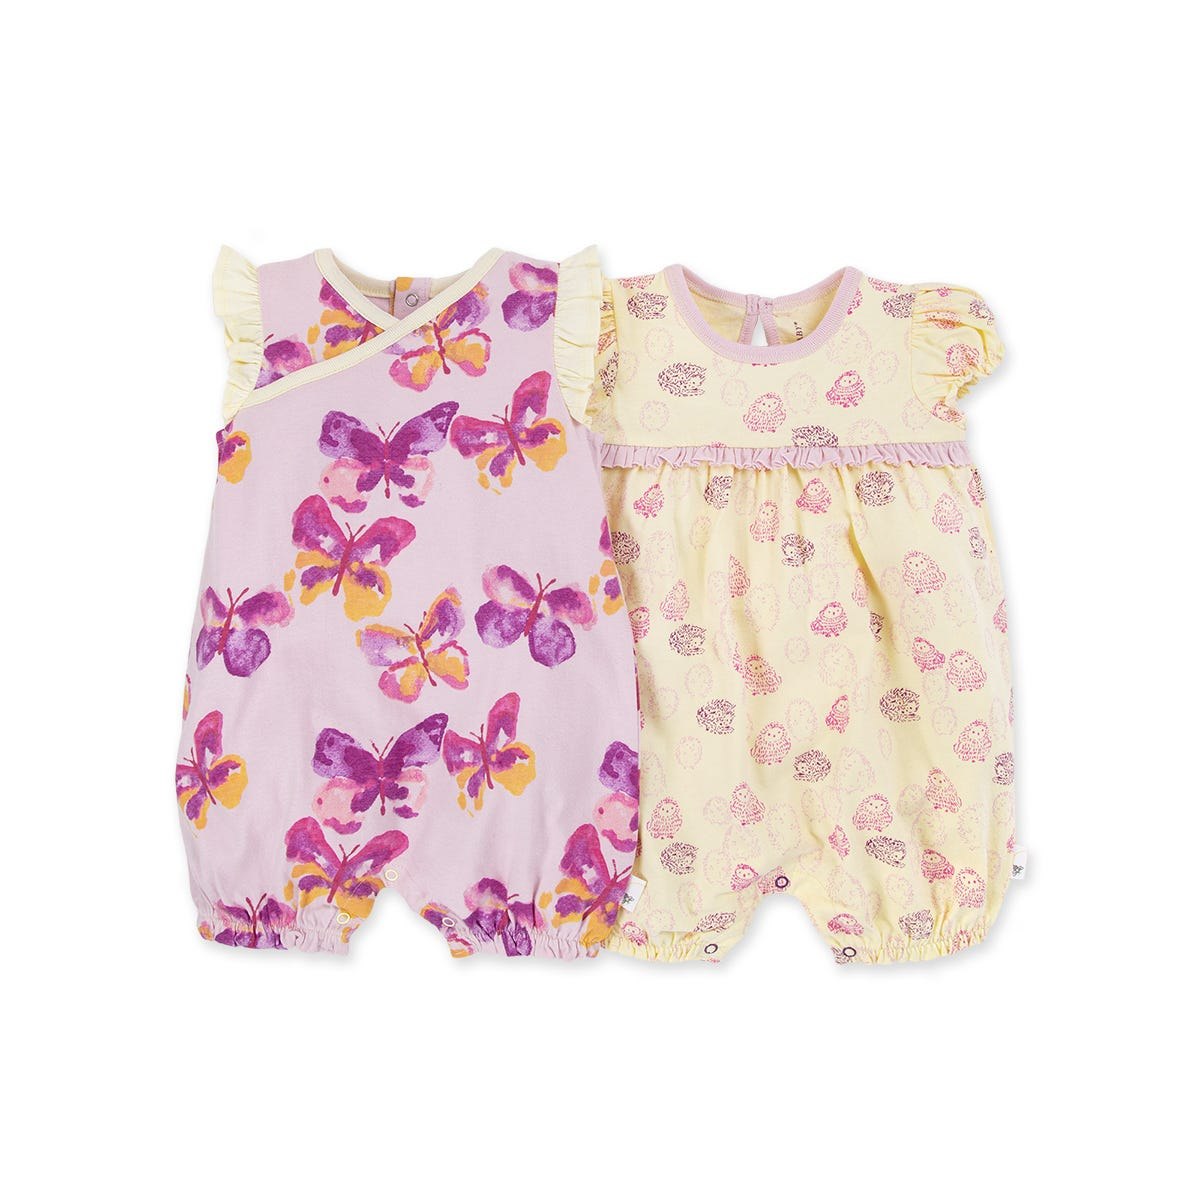 Contact Baby 3 Pc Set Girls Love Butterflies PJ Bodysuit and Bib Pink Butterfly